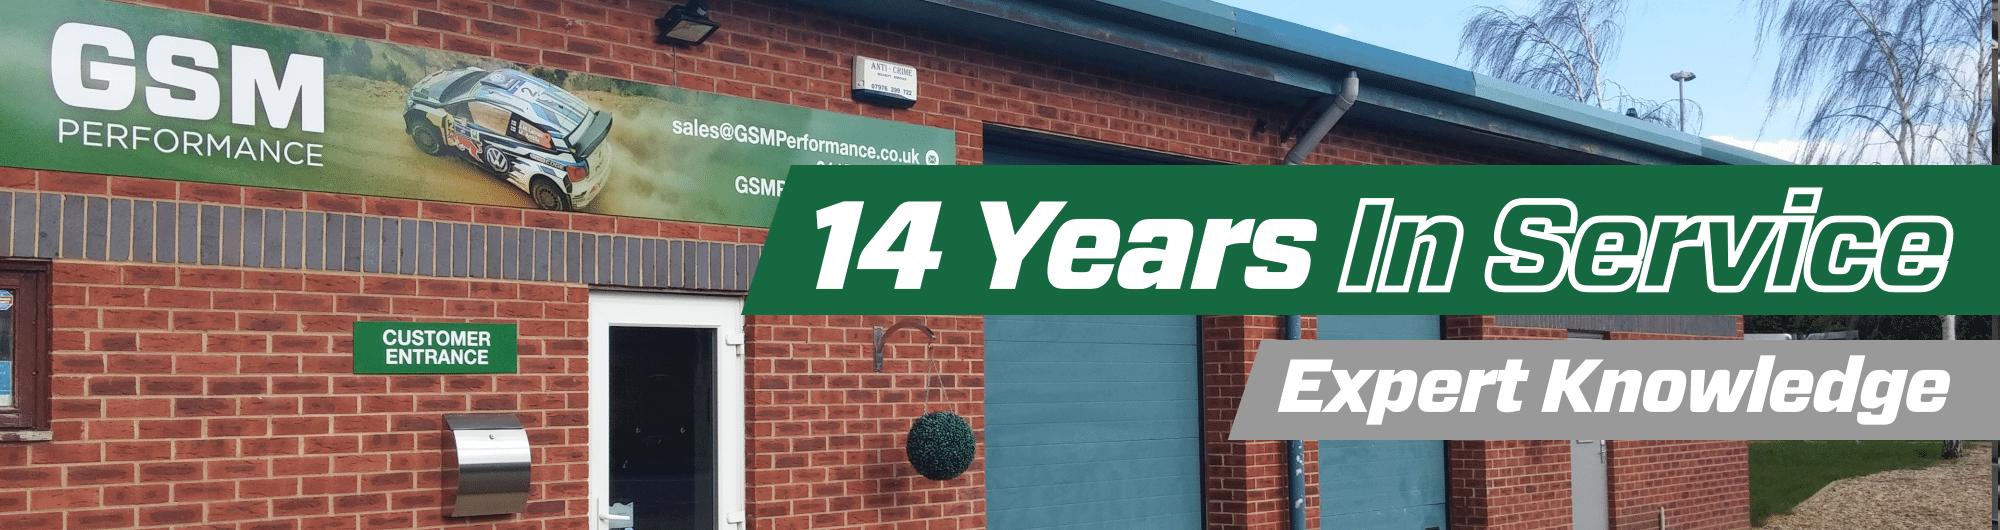 14 Years in Service – Expert Knowledge – www.gsmotorsport.co.uk Hero Image – October 2017